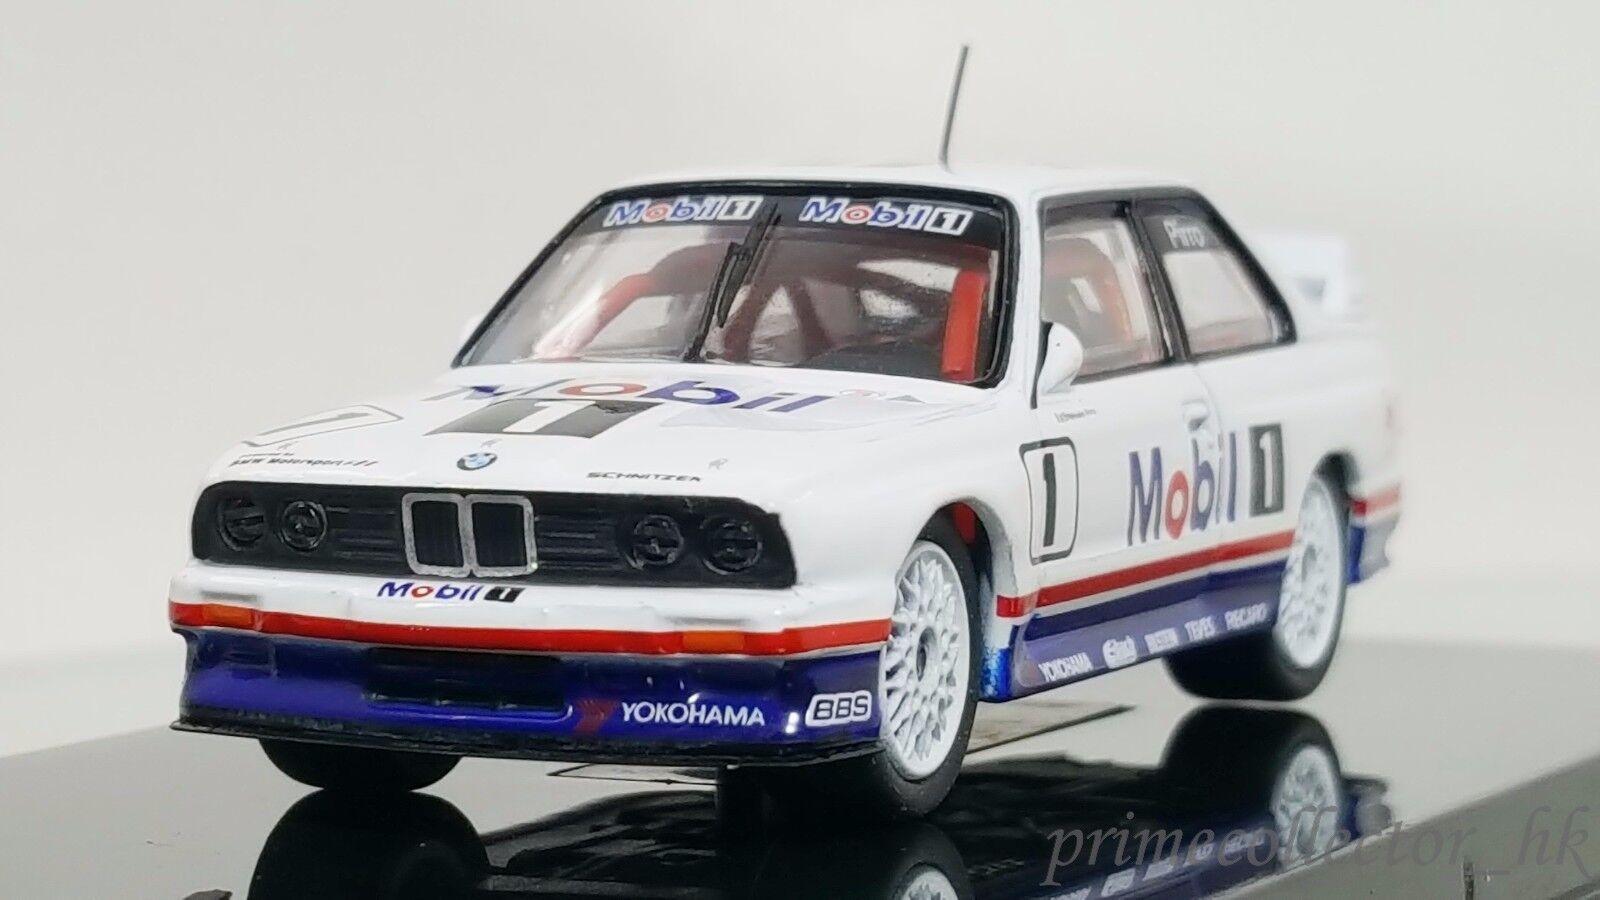 TARMAC arbetar 1 64 BMW M3 E30 Evo 1992 bilen T64 -009 -92MAC